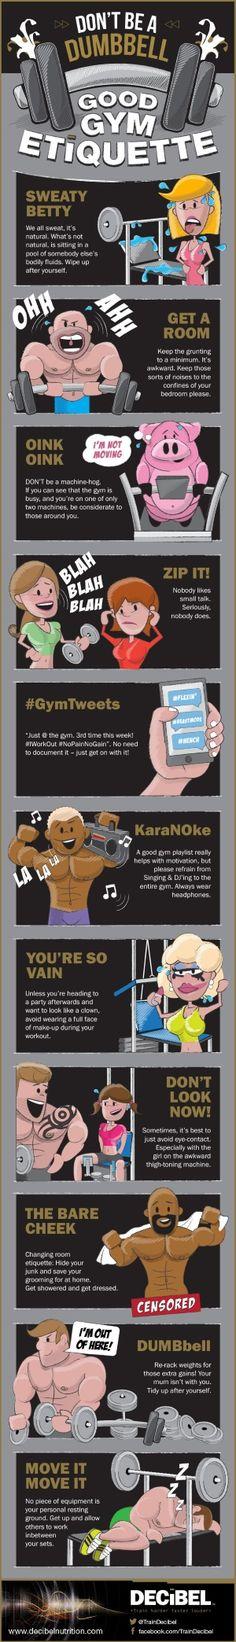 Don't Be A Dumbbell - Good Gym Etiquette